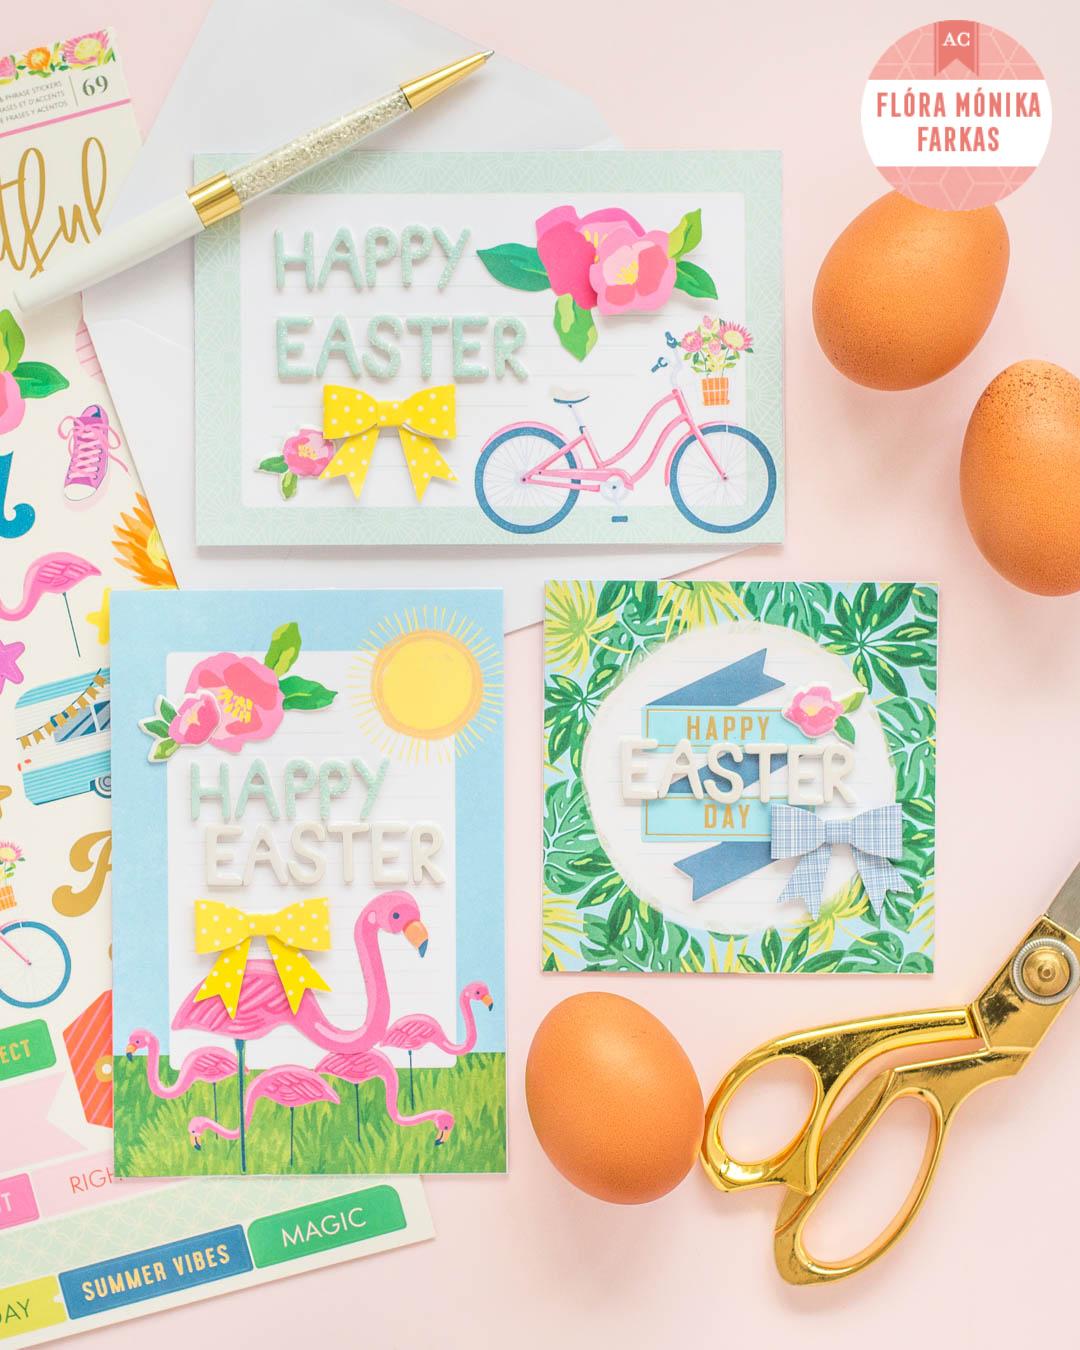 American Crafts Studio Blog An Adorable Easter Card Trio